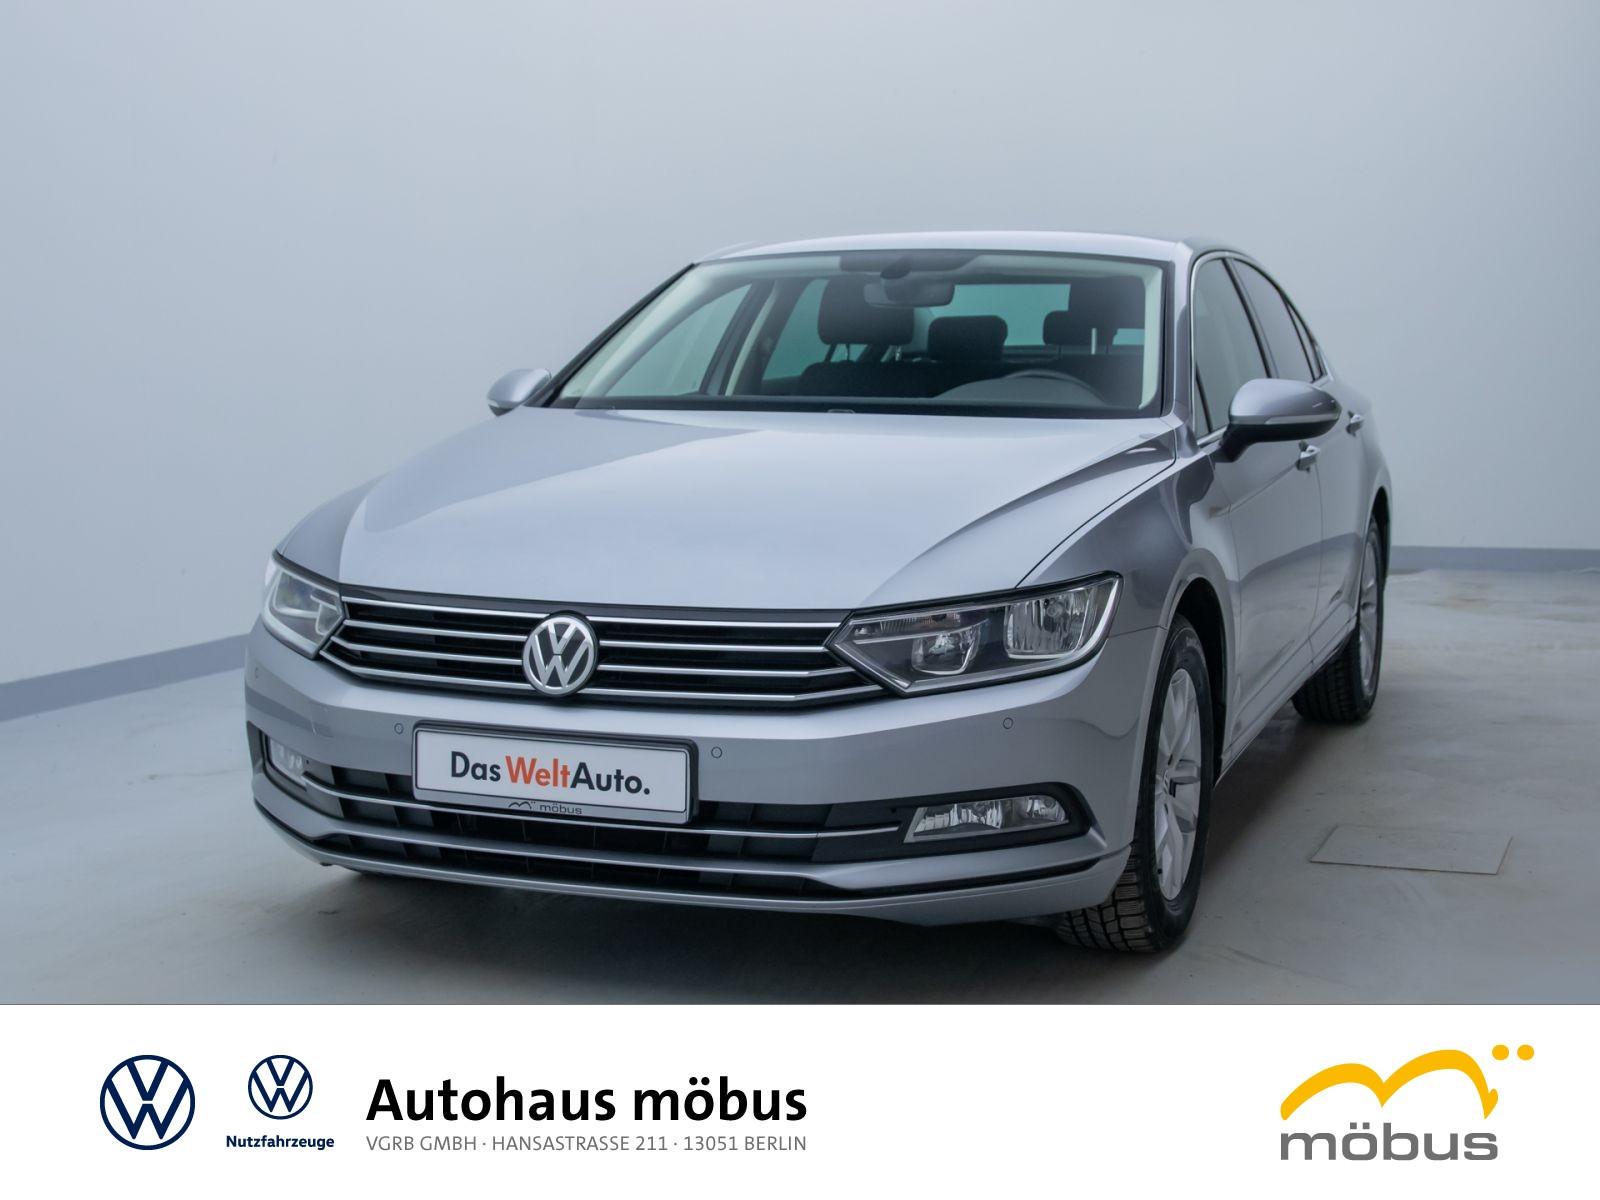 Volkswagen Passat 1.4 TSI**COMFORTL*NAVI*GANZJAHRESREIFEN**, Jahr 2018, Benzin